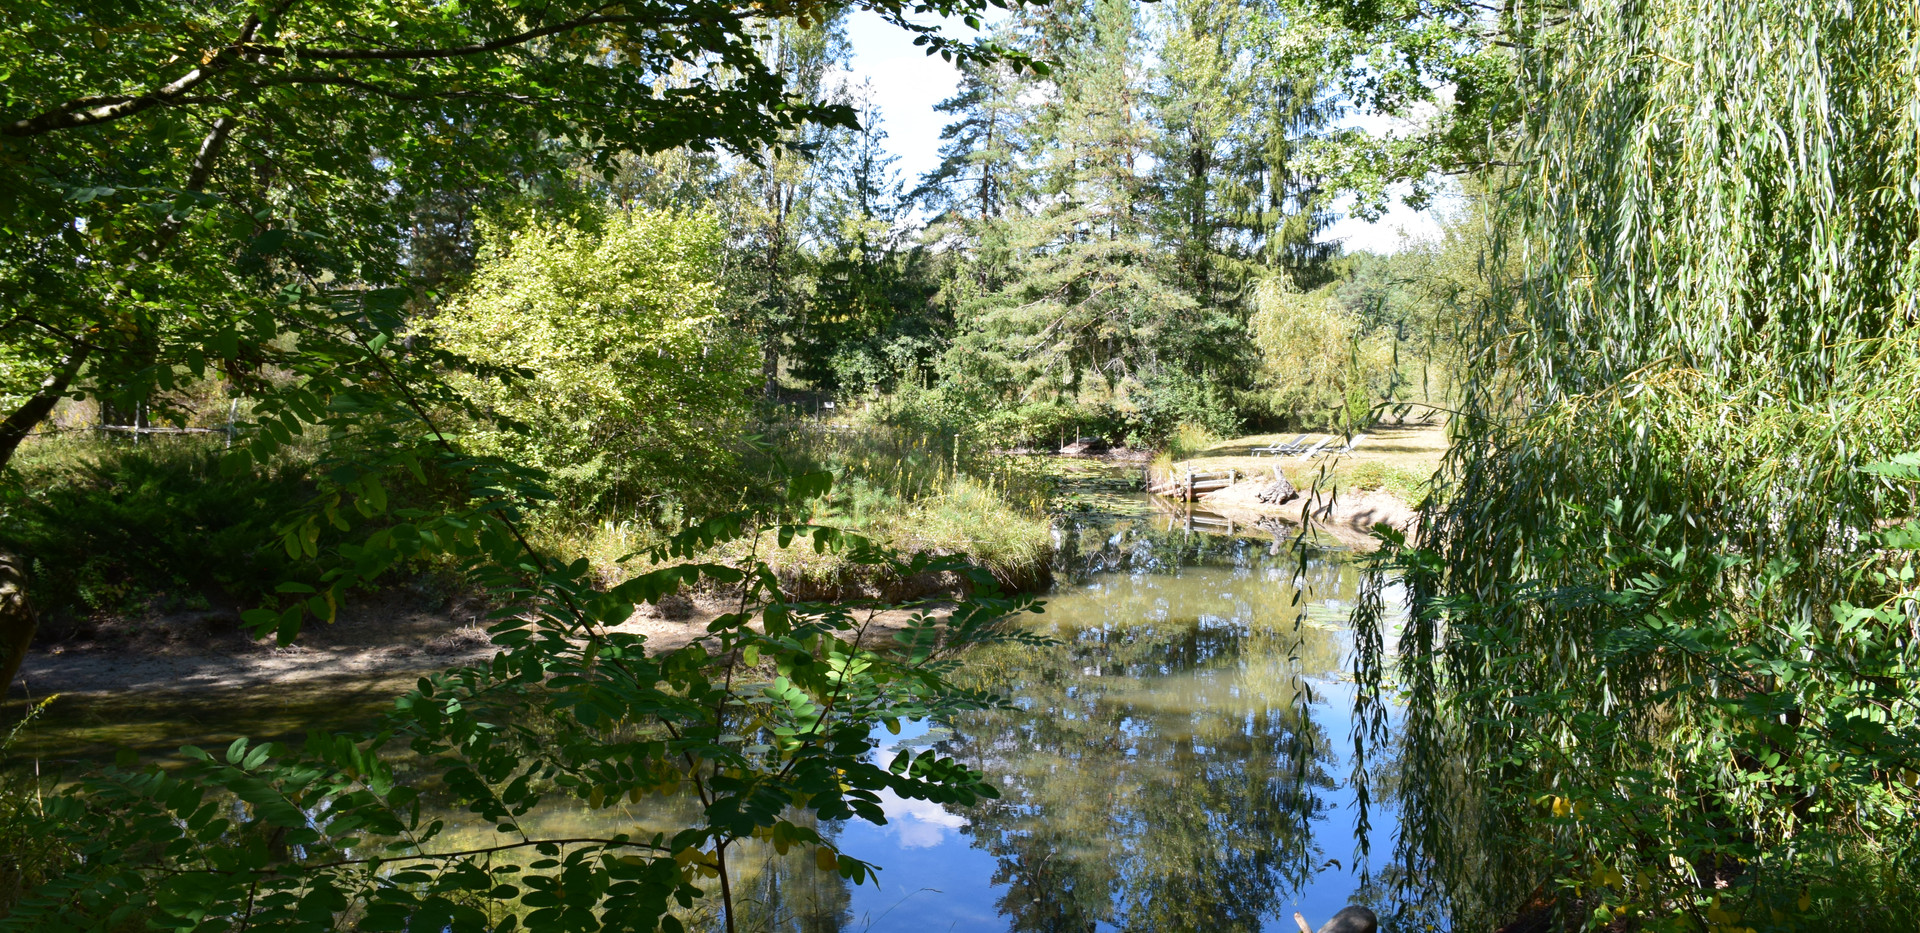 parc et étang